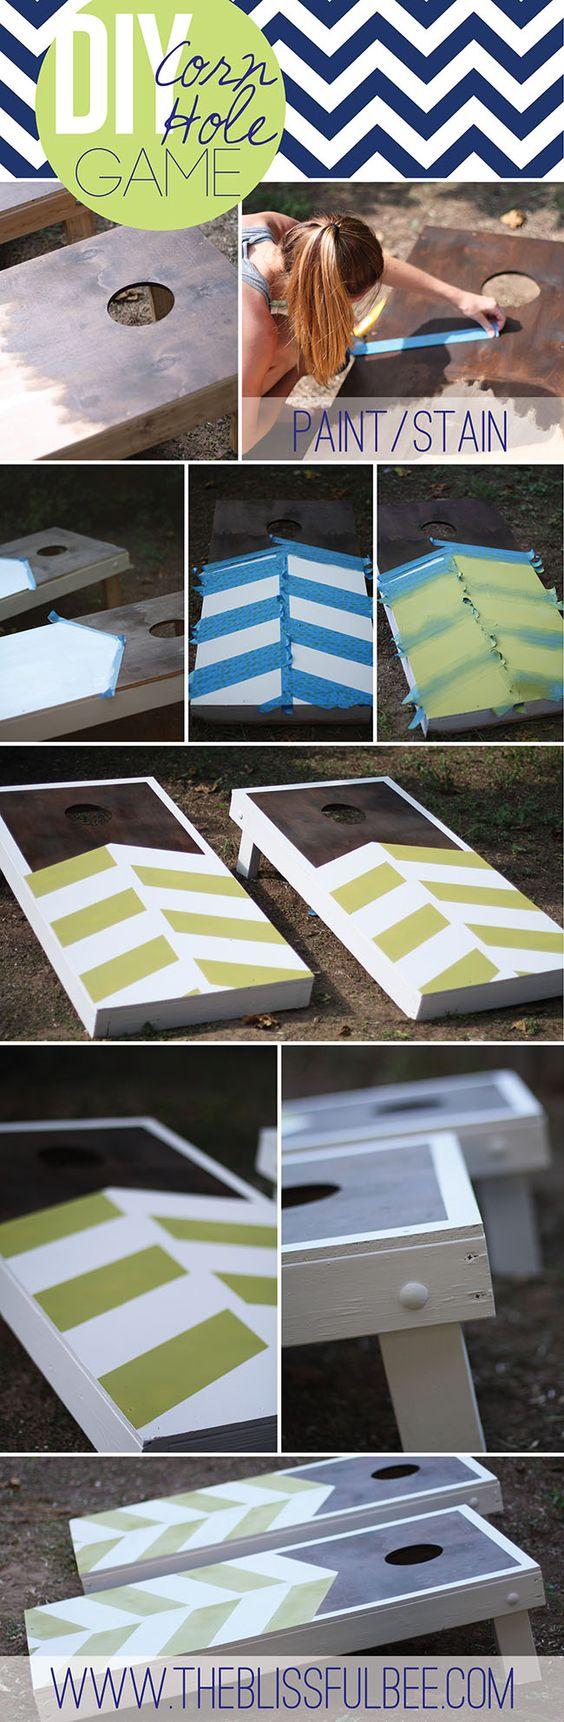 paintstain_cornhole_montage outdoor events pinterest cornhole diy cornhole and diy bean bag - Cornhole Design Ideas